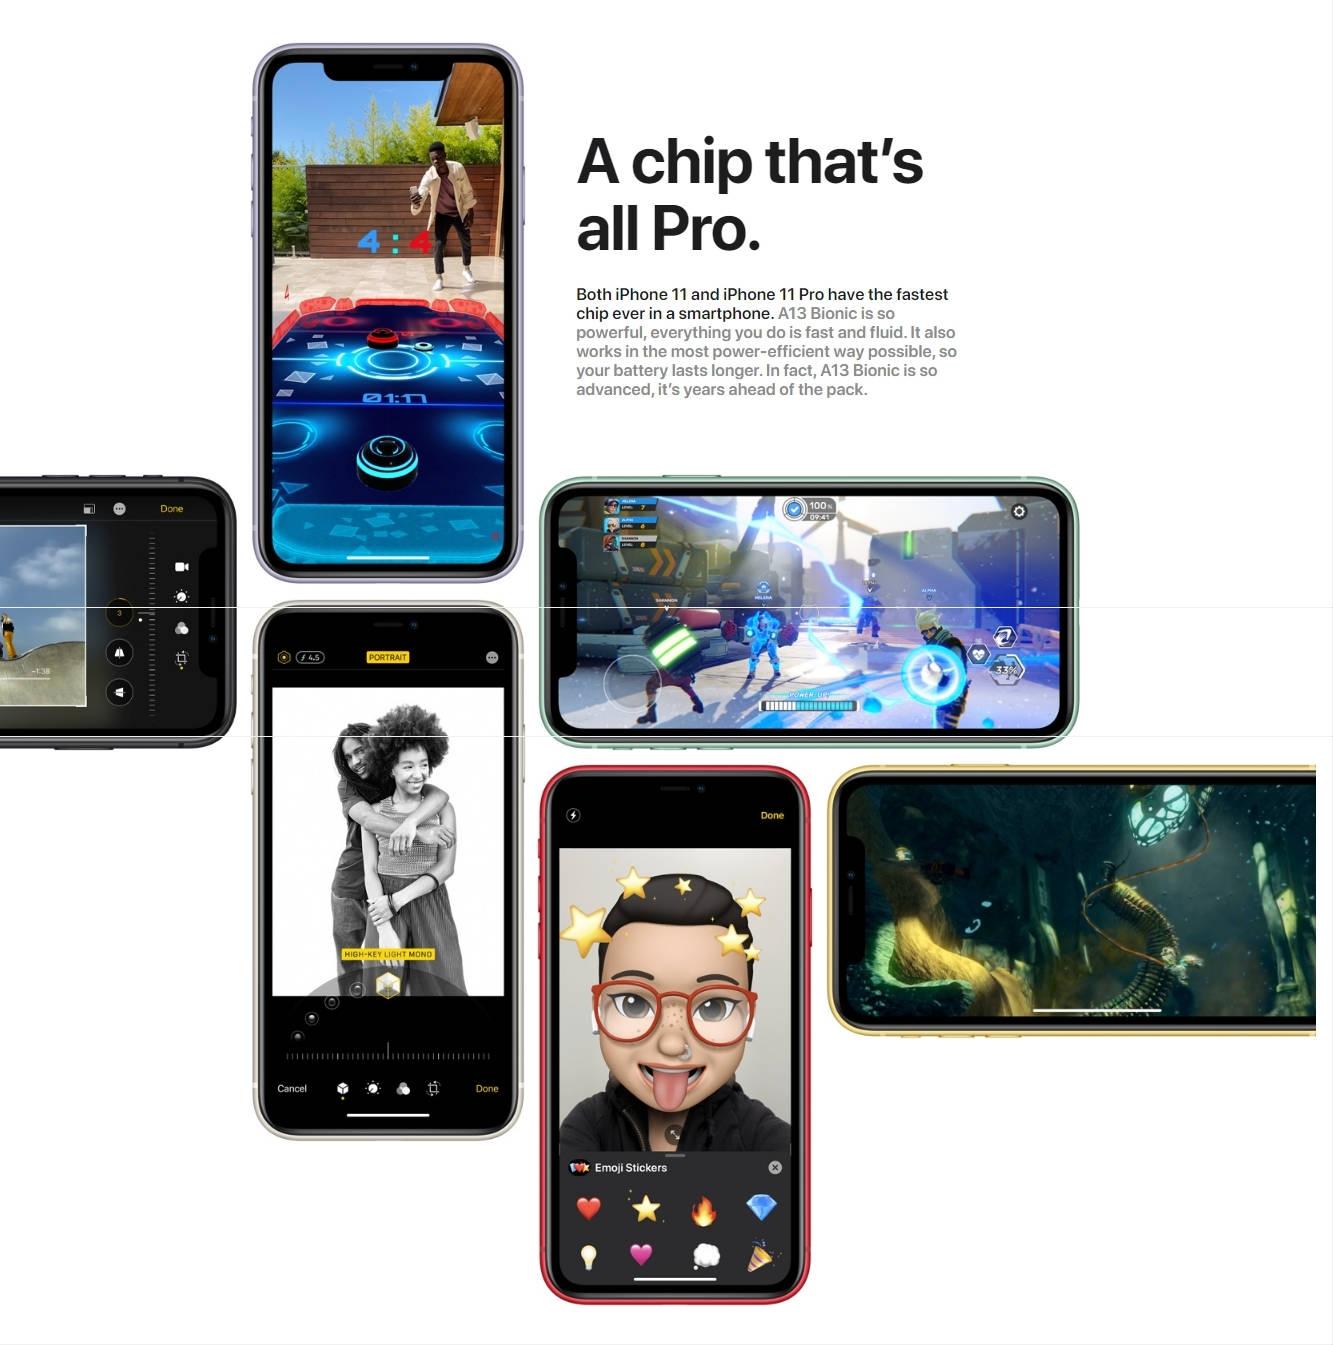 Apple IPhone 11 Dual SIM With FaceTime Black 128GB 4G LTE-HK Specs